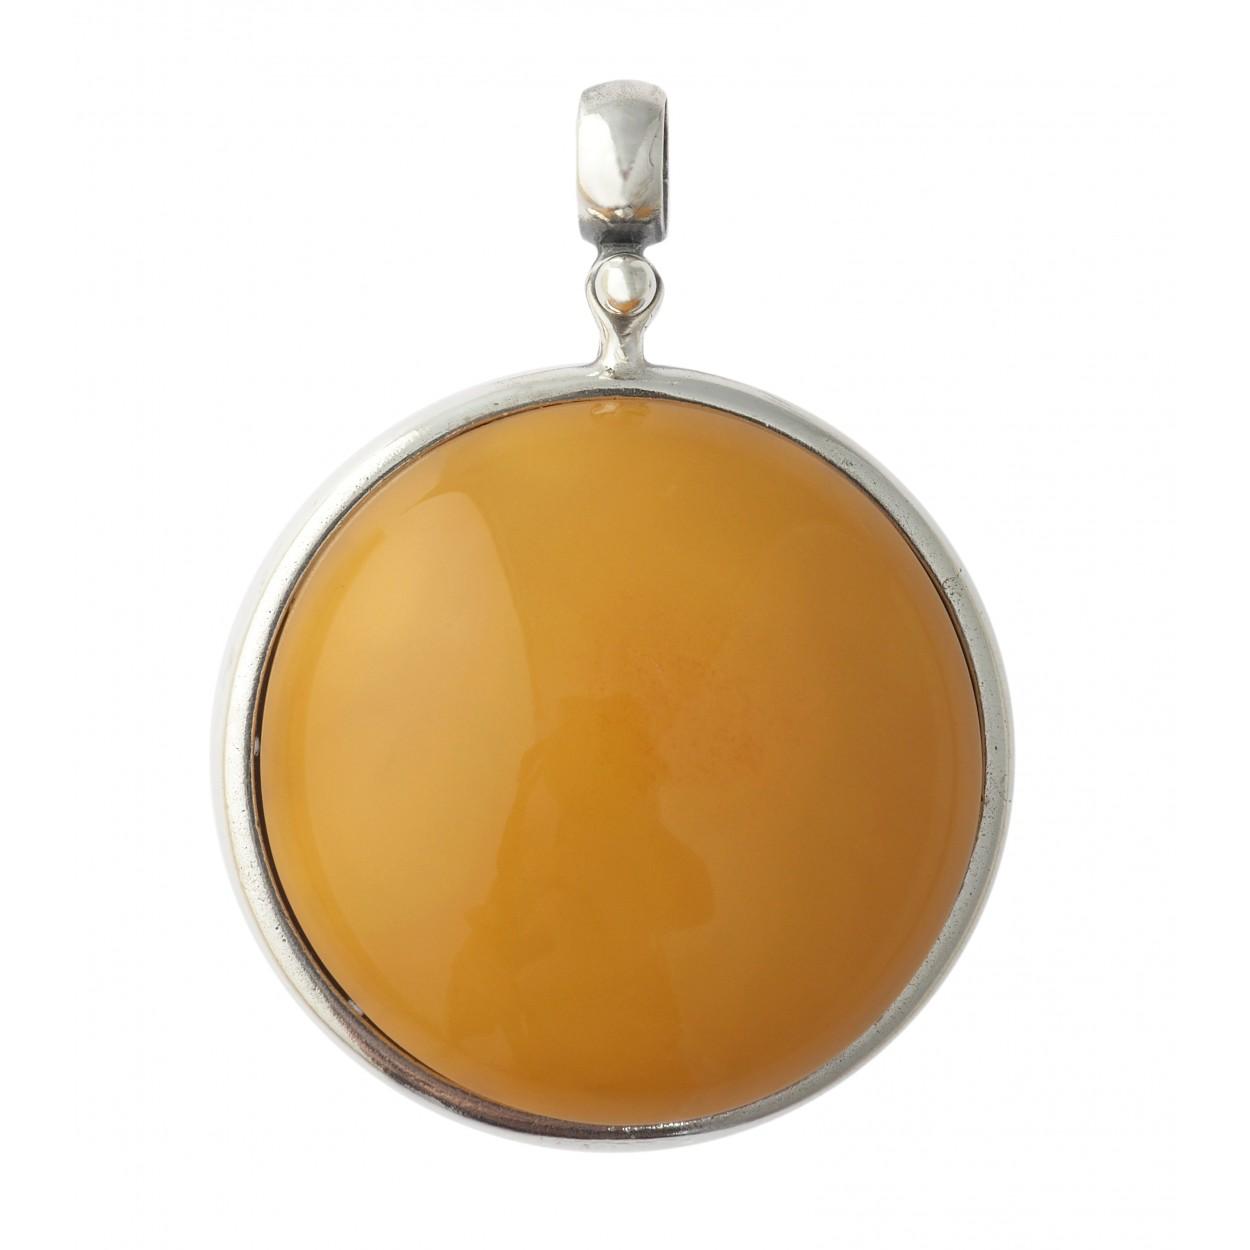 Visible Amber Pendant